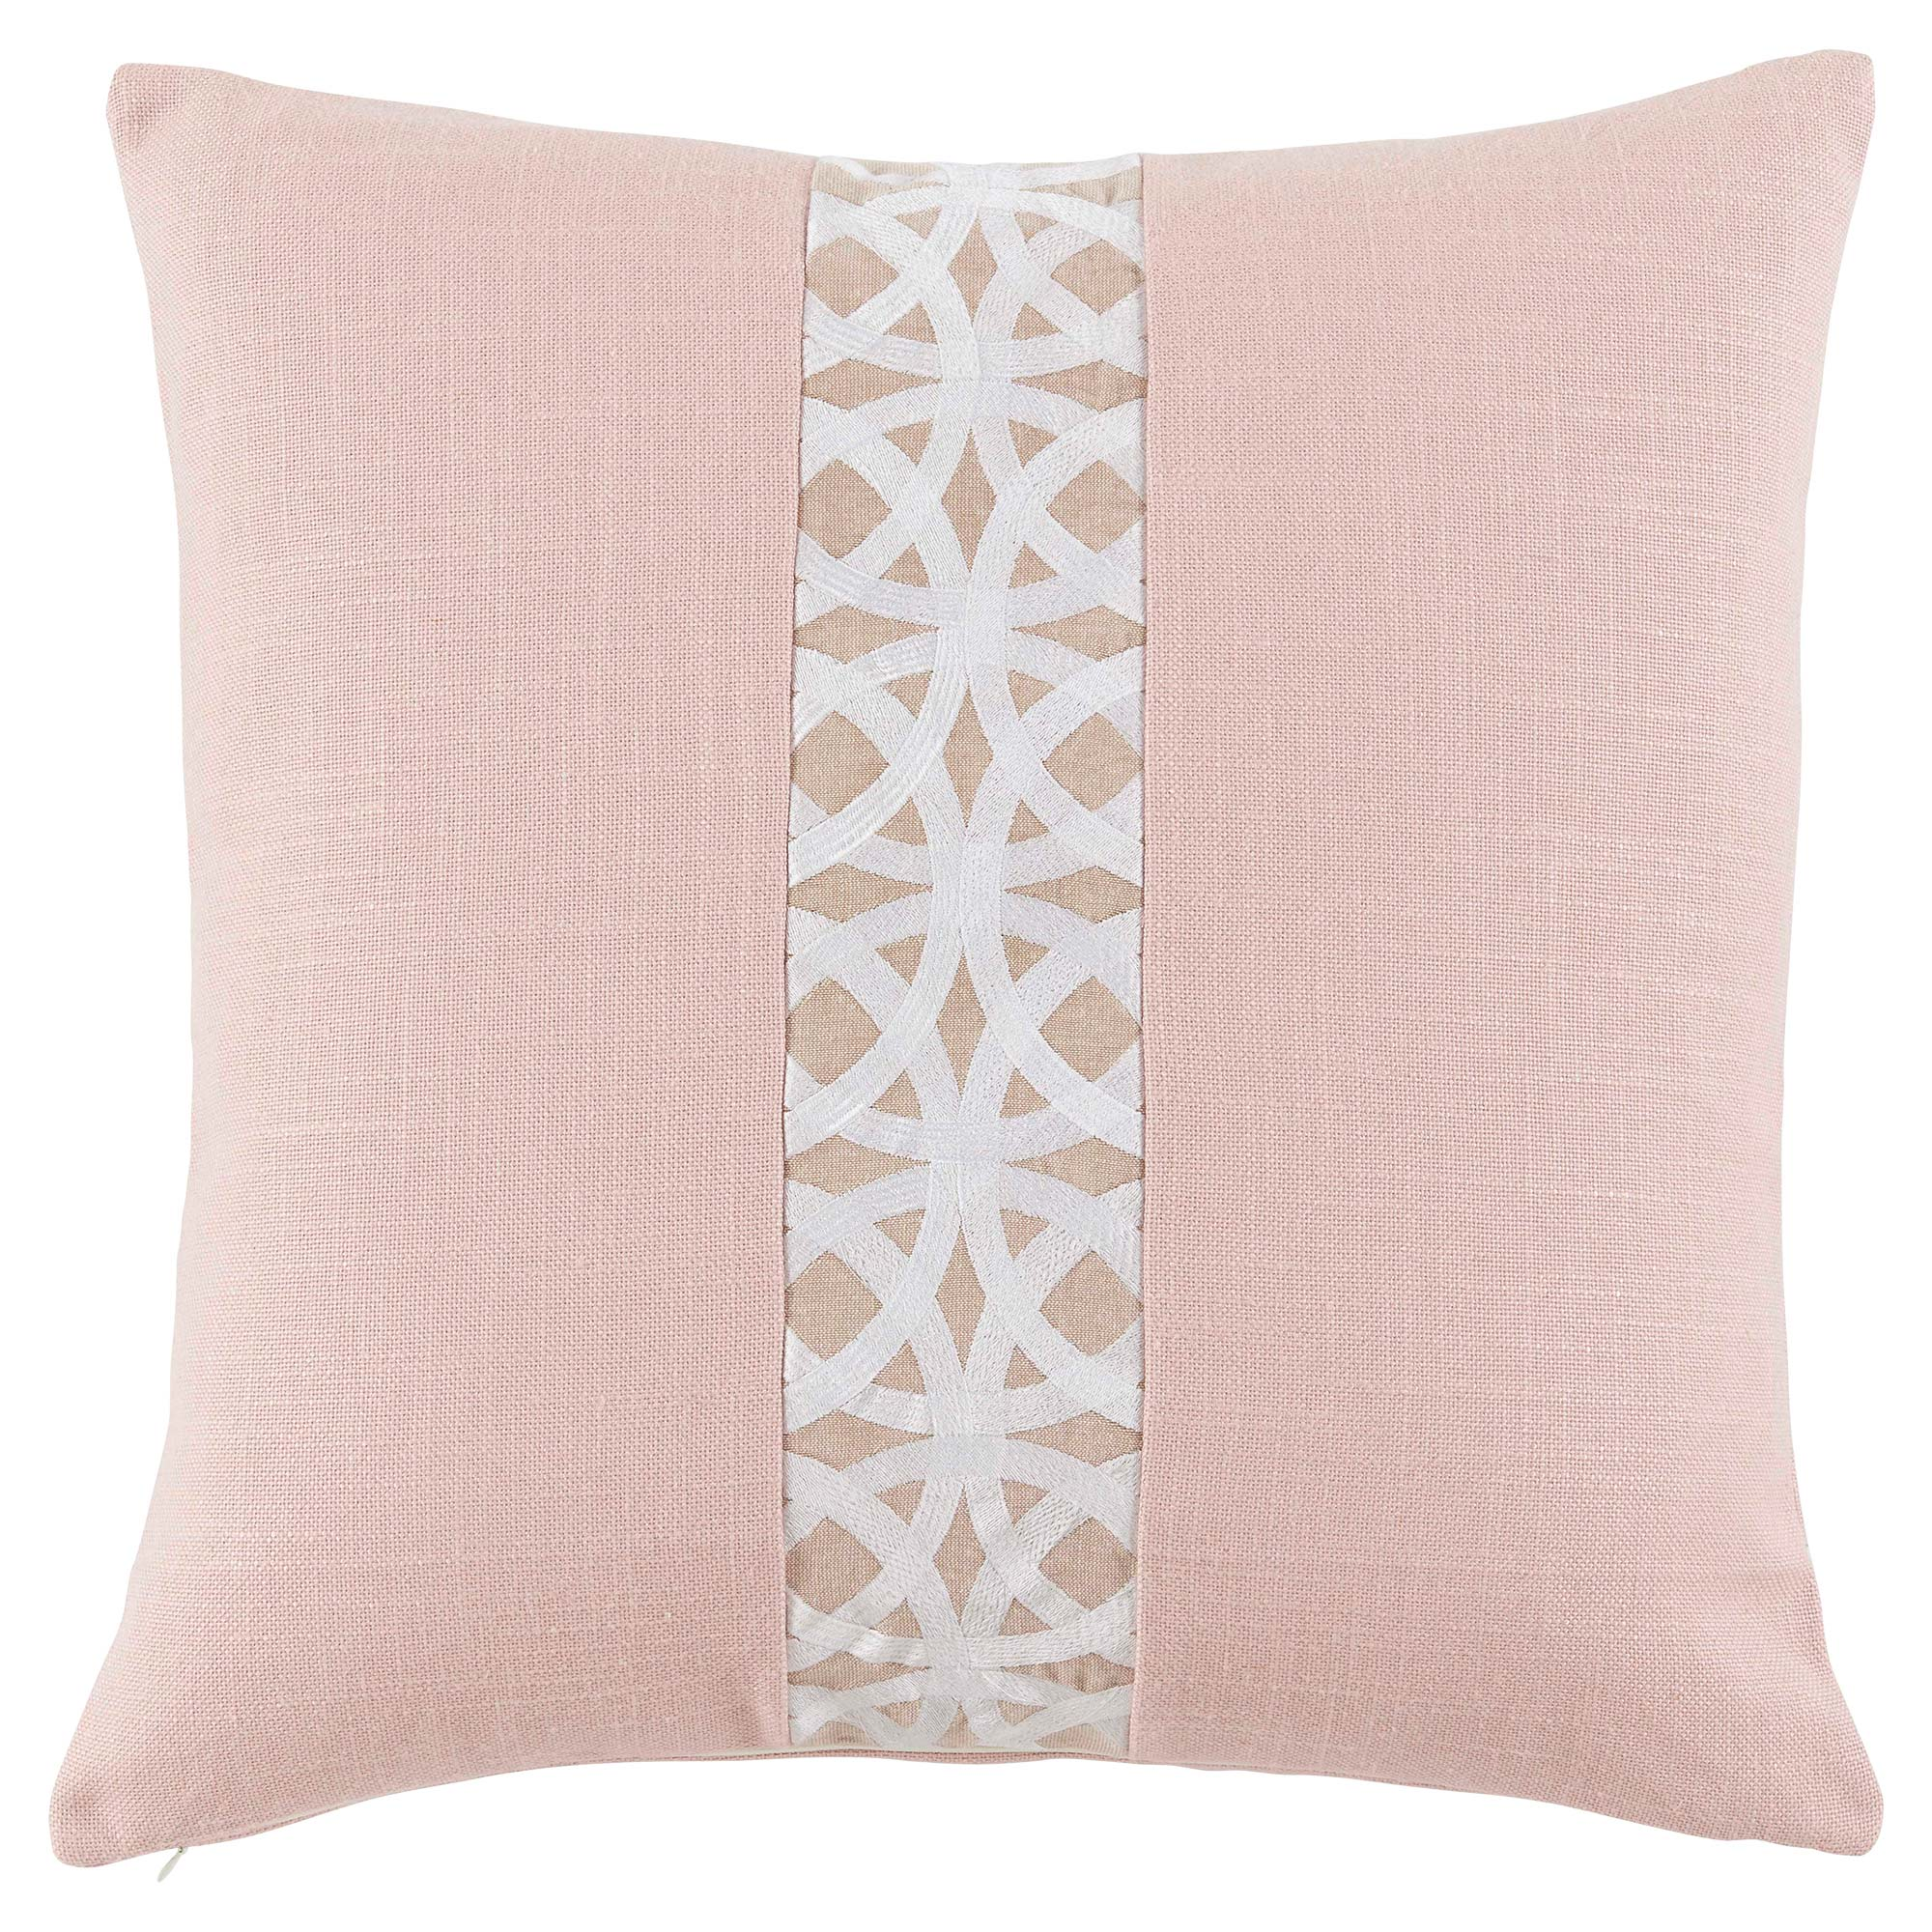 Dorsa Coastal Trellis Stripe Rose Pink Pillow - 22x22